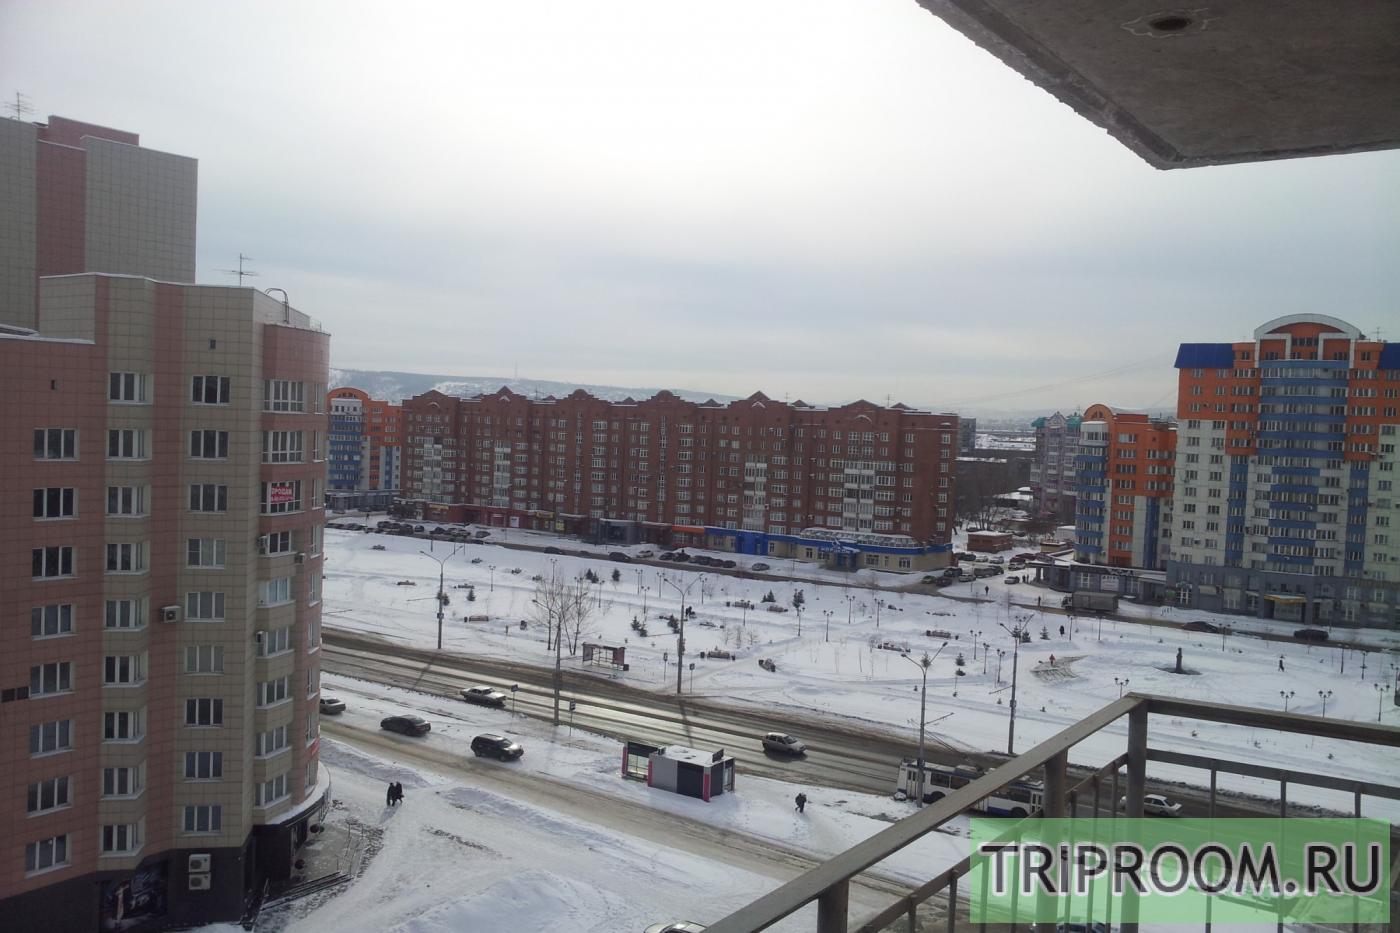 1-комнатная квартира посуточно (вариант № 30838), ул. Ермакова улица, фото № 24